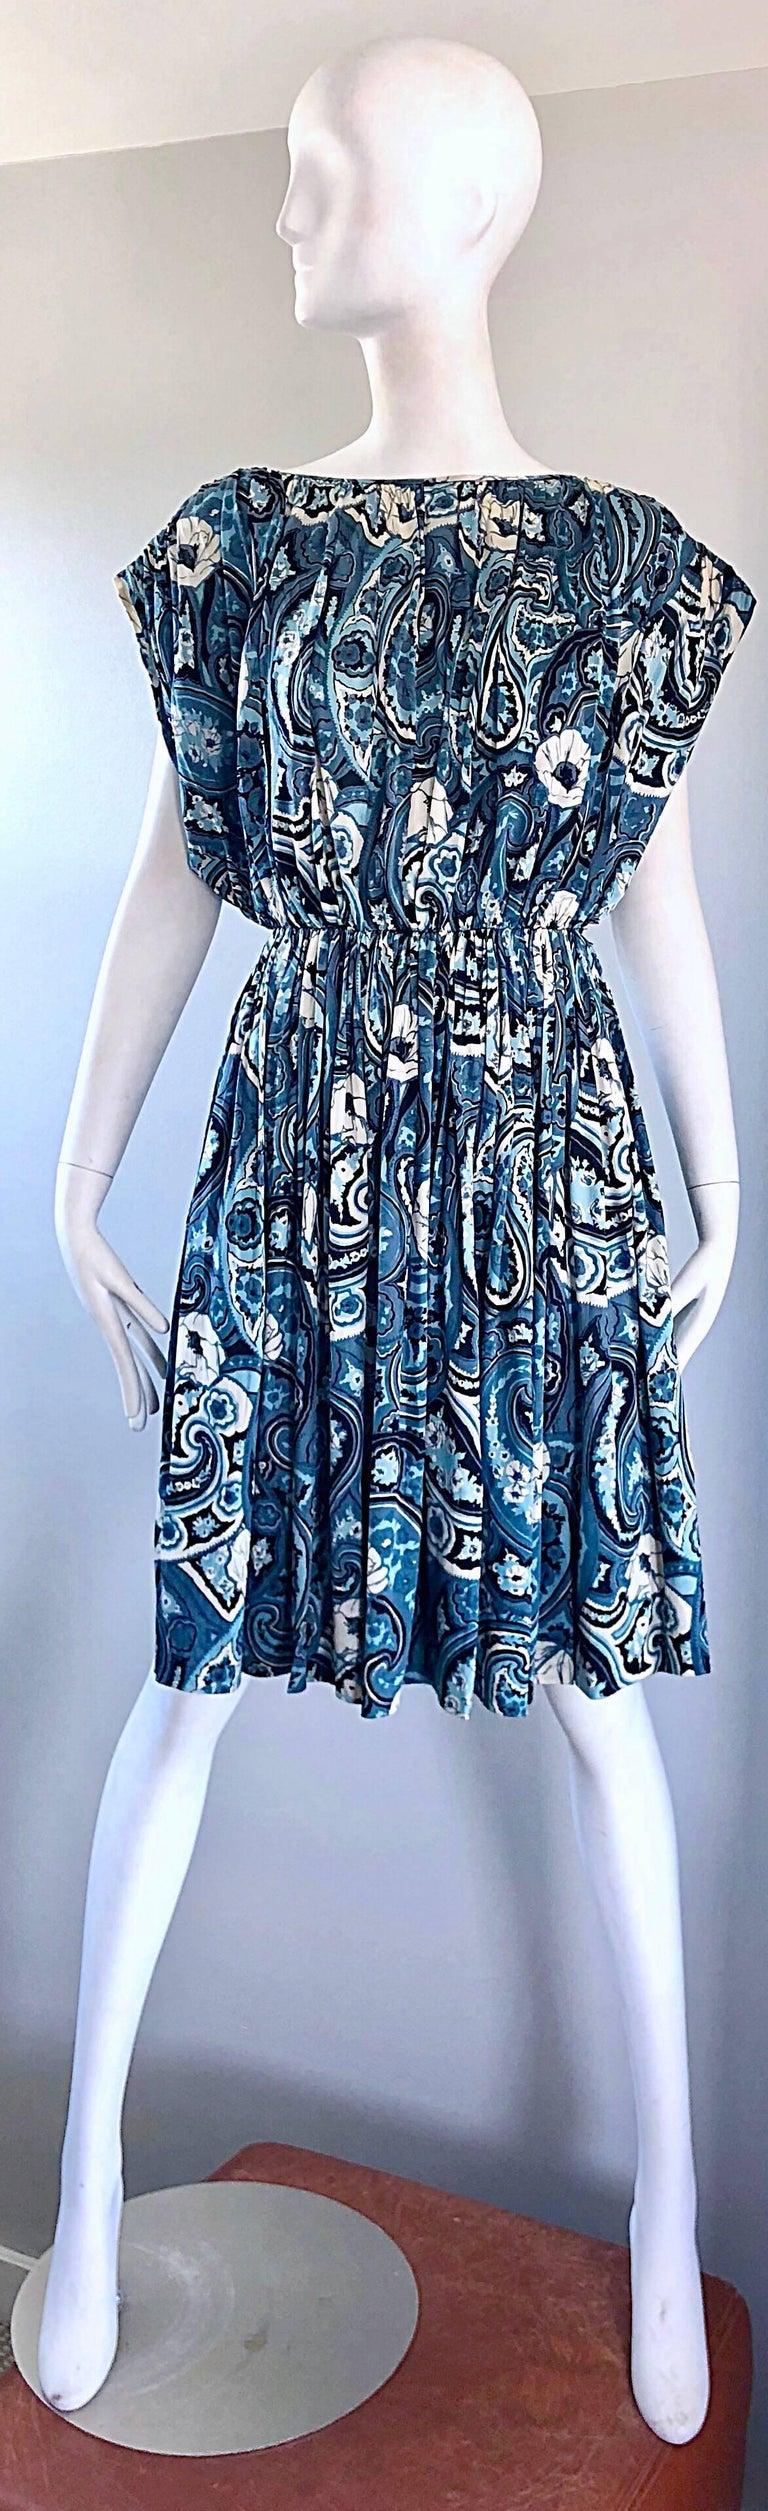 Rare 1950s Townley Blue + White Paisley Flower Print Vintage 50s Dress For Sale 12